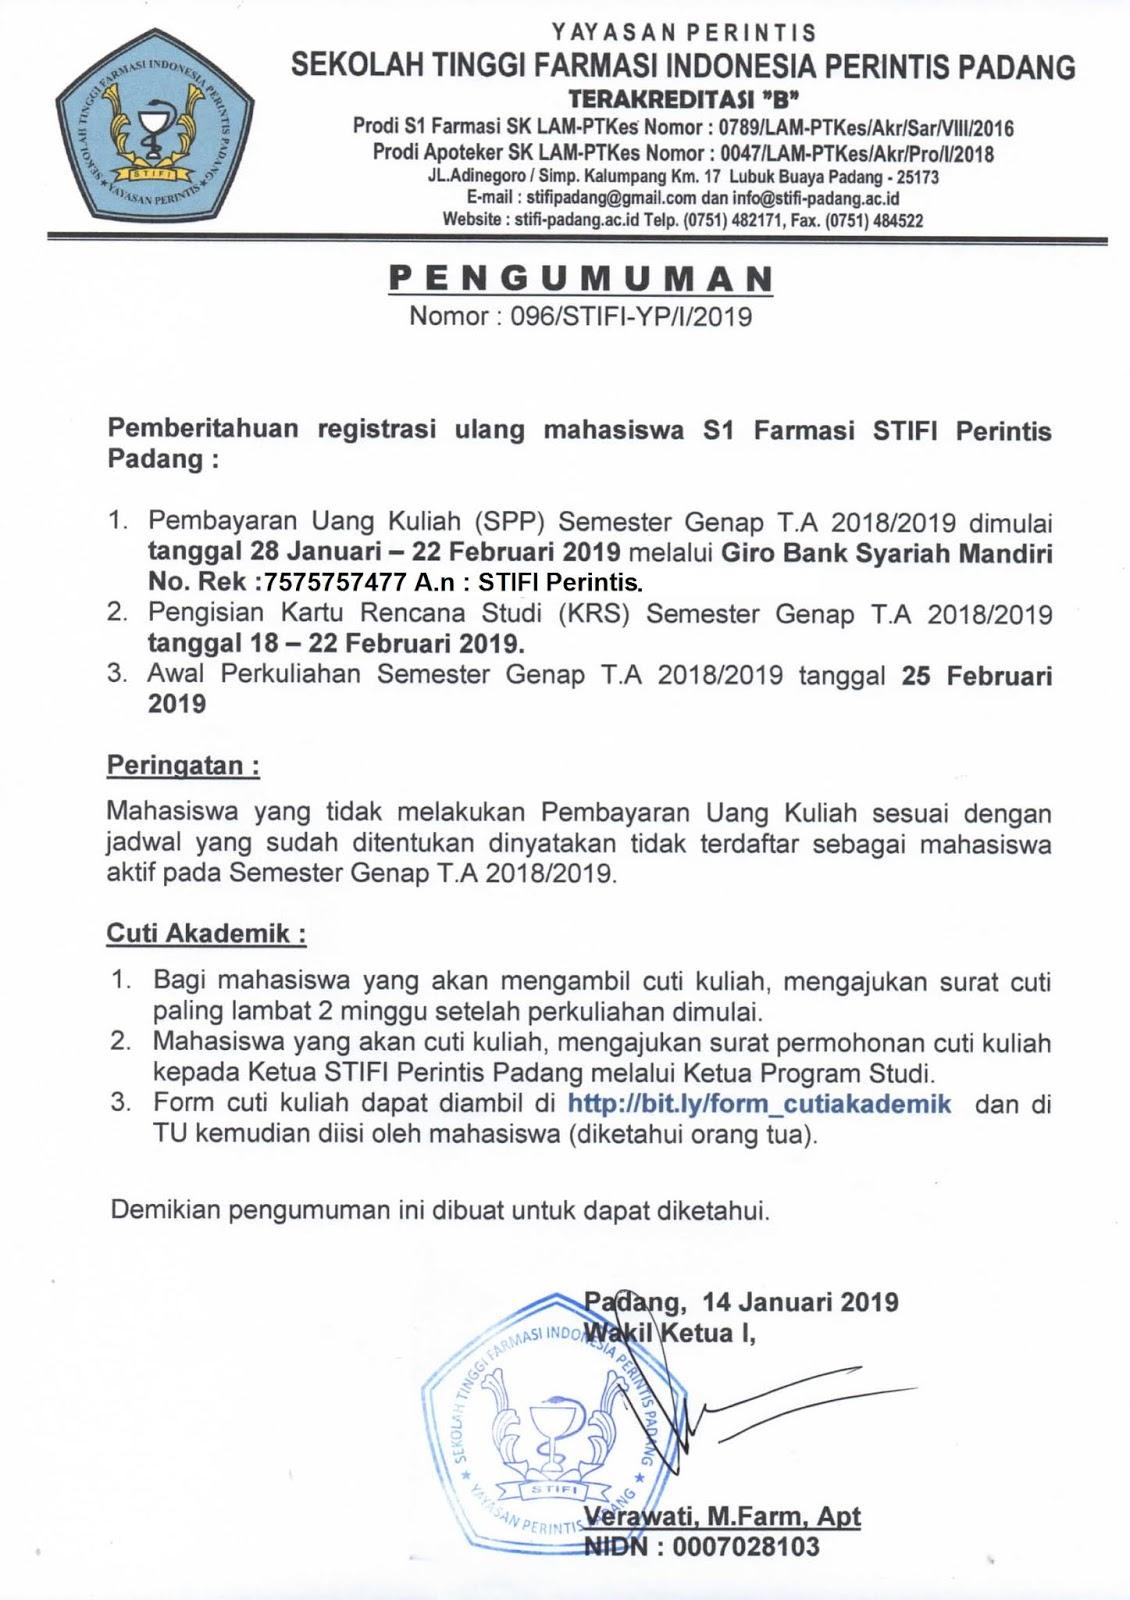 PENGUMUMAN REGISTRASI ULANG SMT GENAP T.A 2018-2019